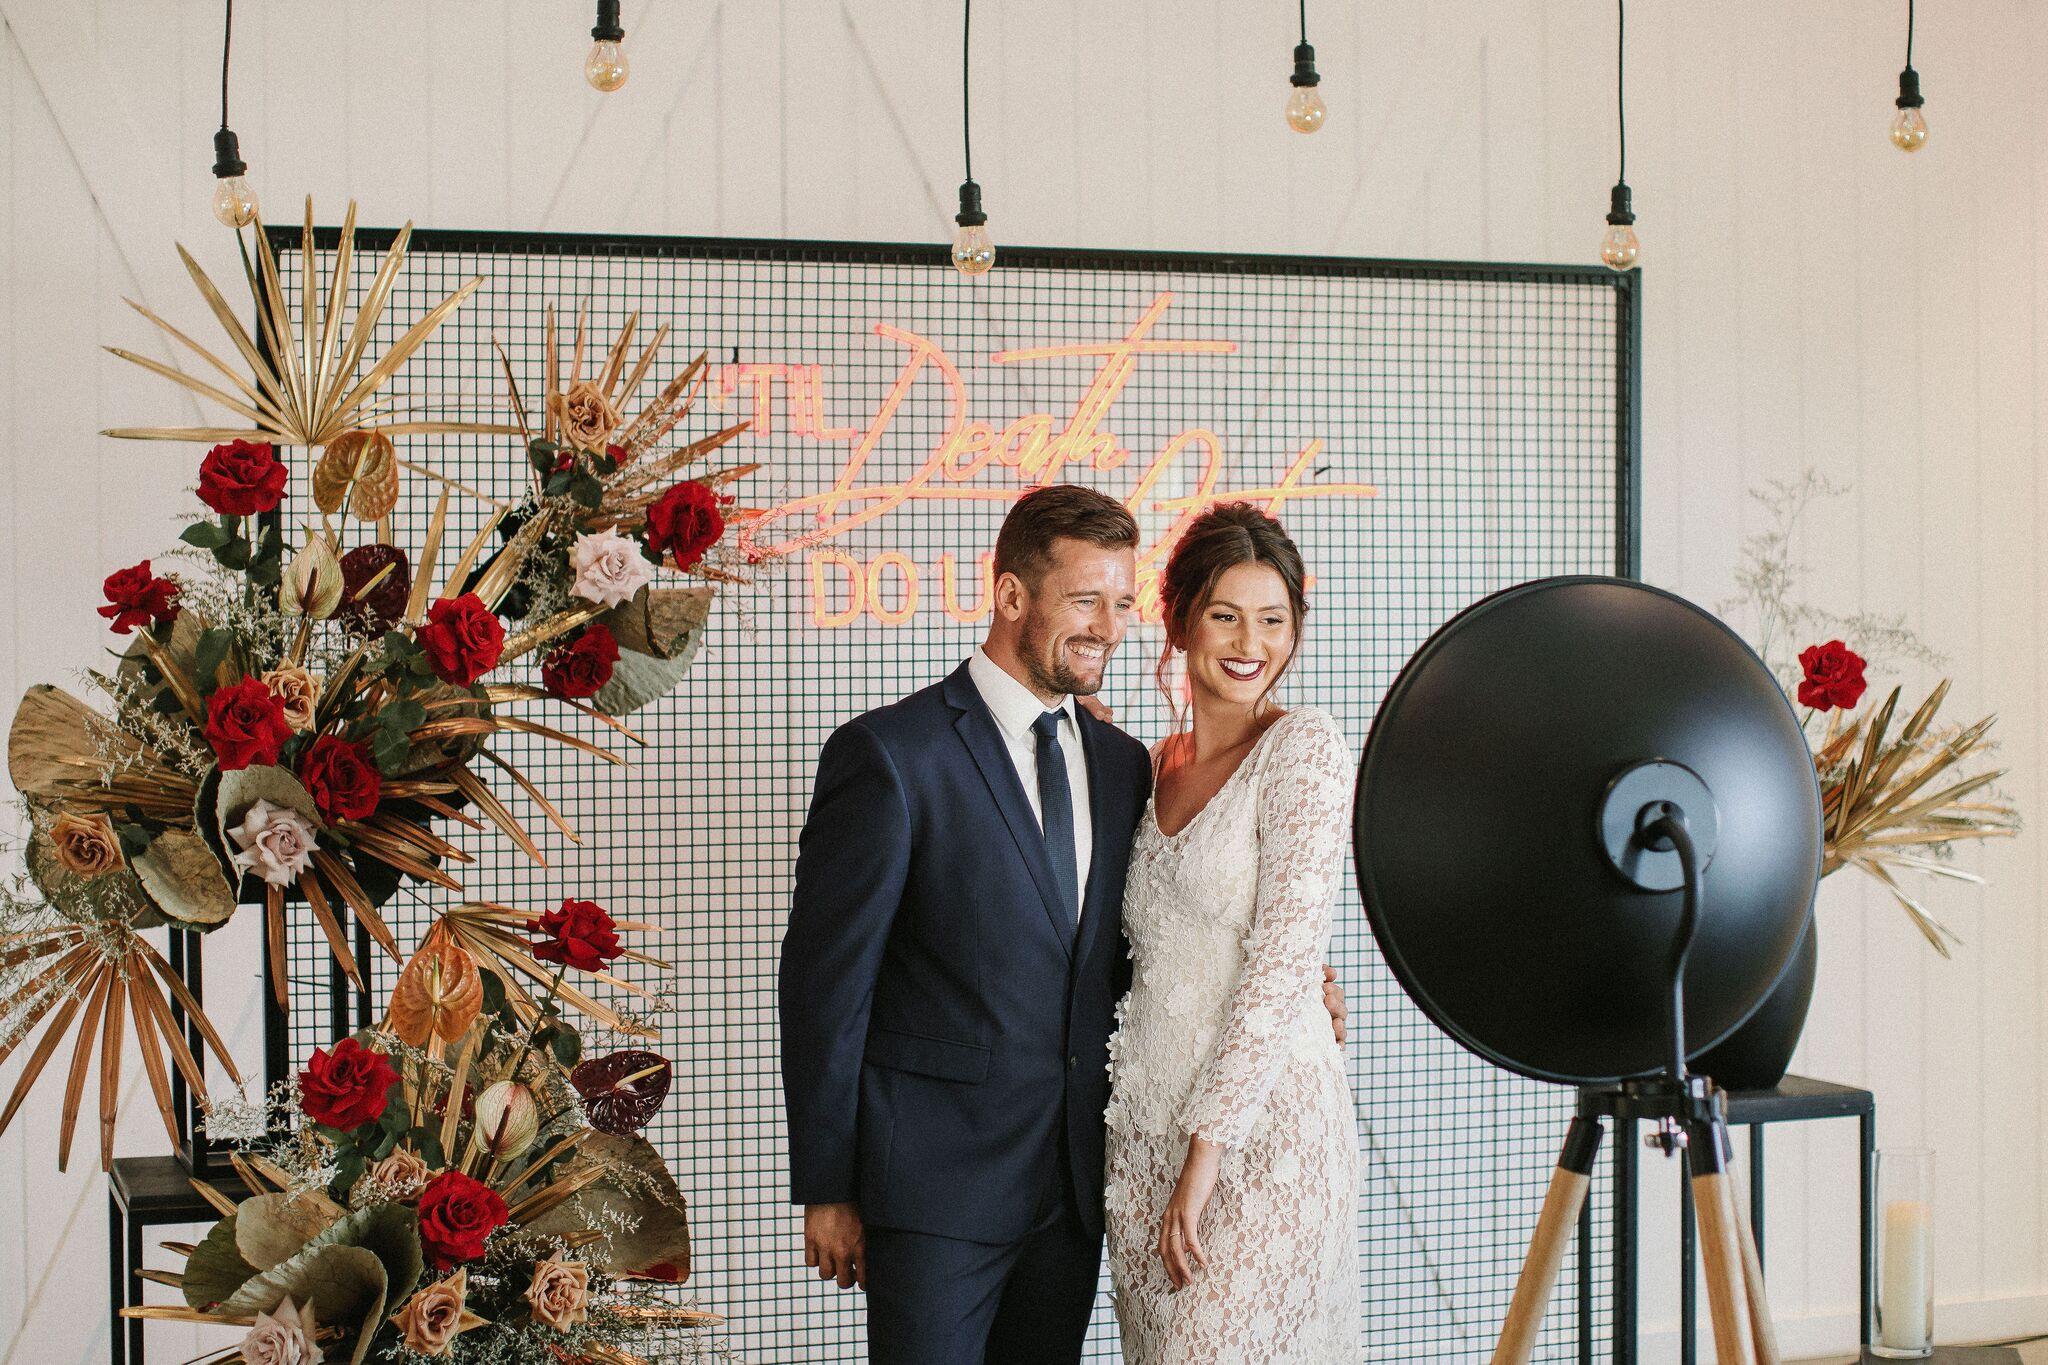 Image via    Tom Judson    / Styled by    Arctic Fox Weddings